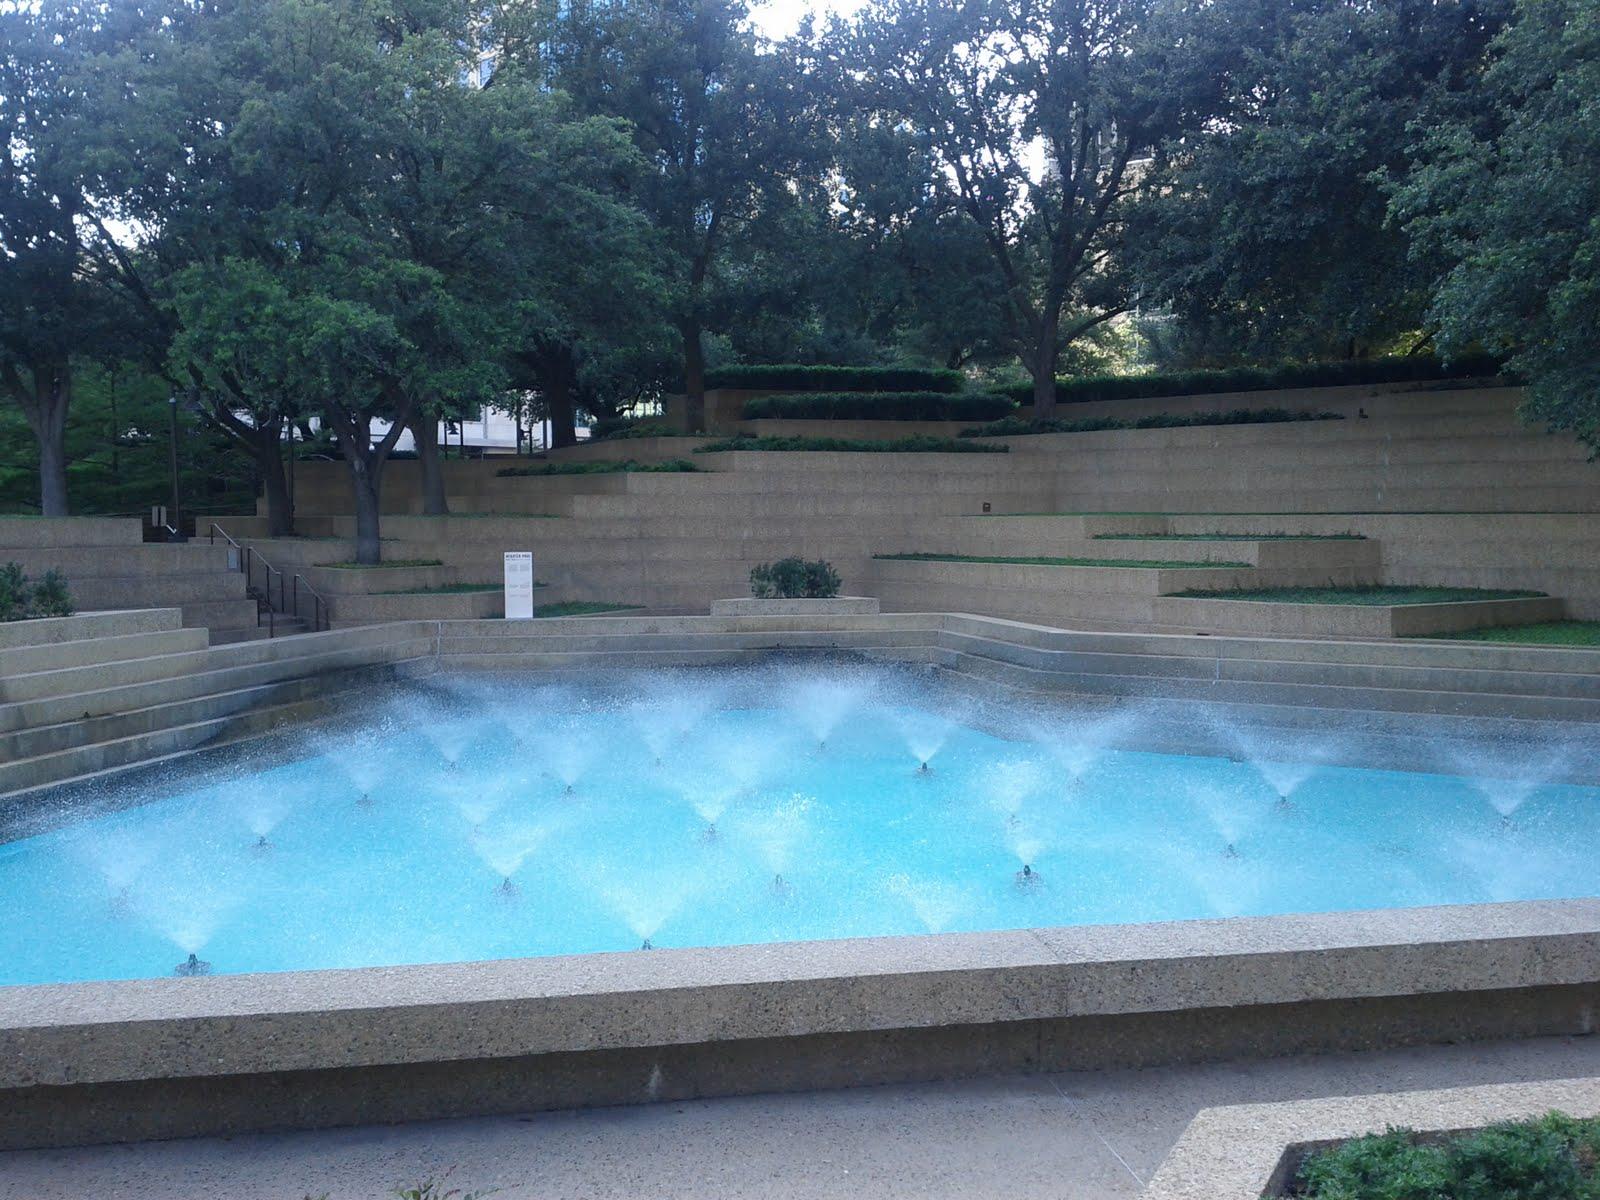 Dallas Fort Worth vacation - IMG_20110611_174540.jpg